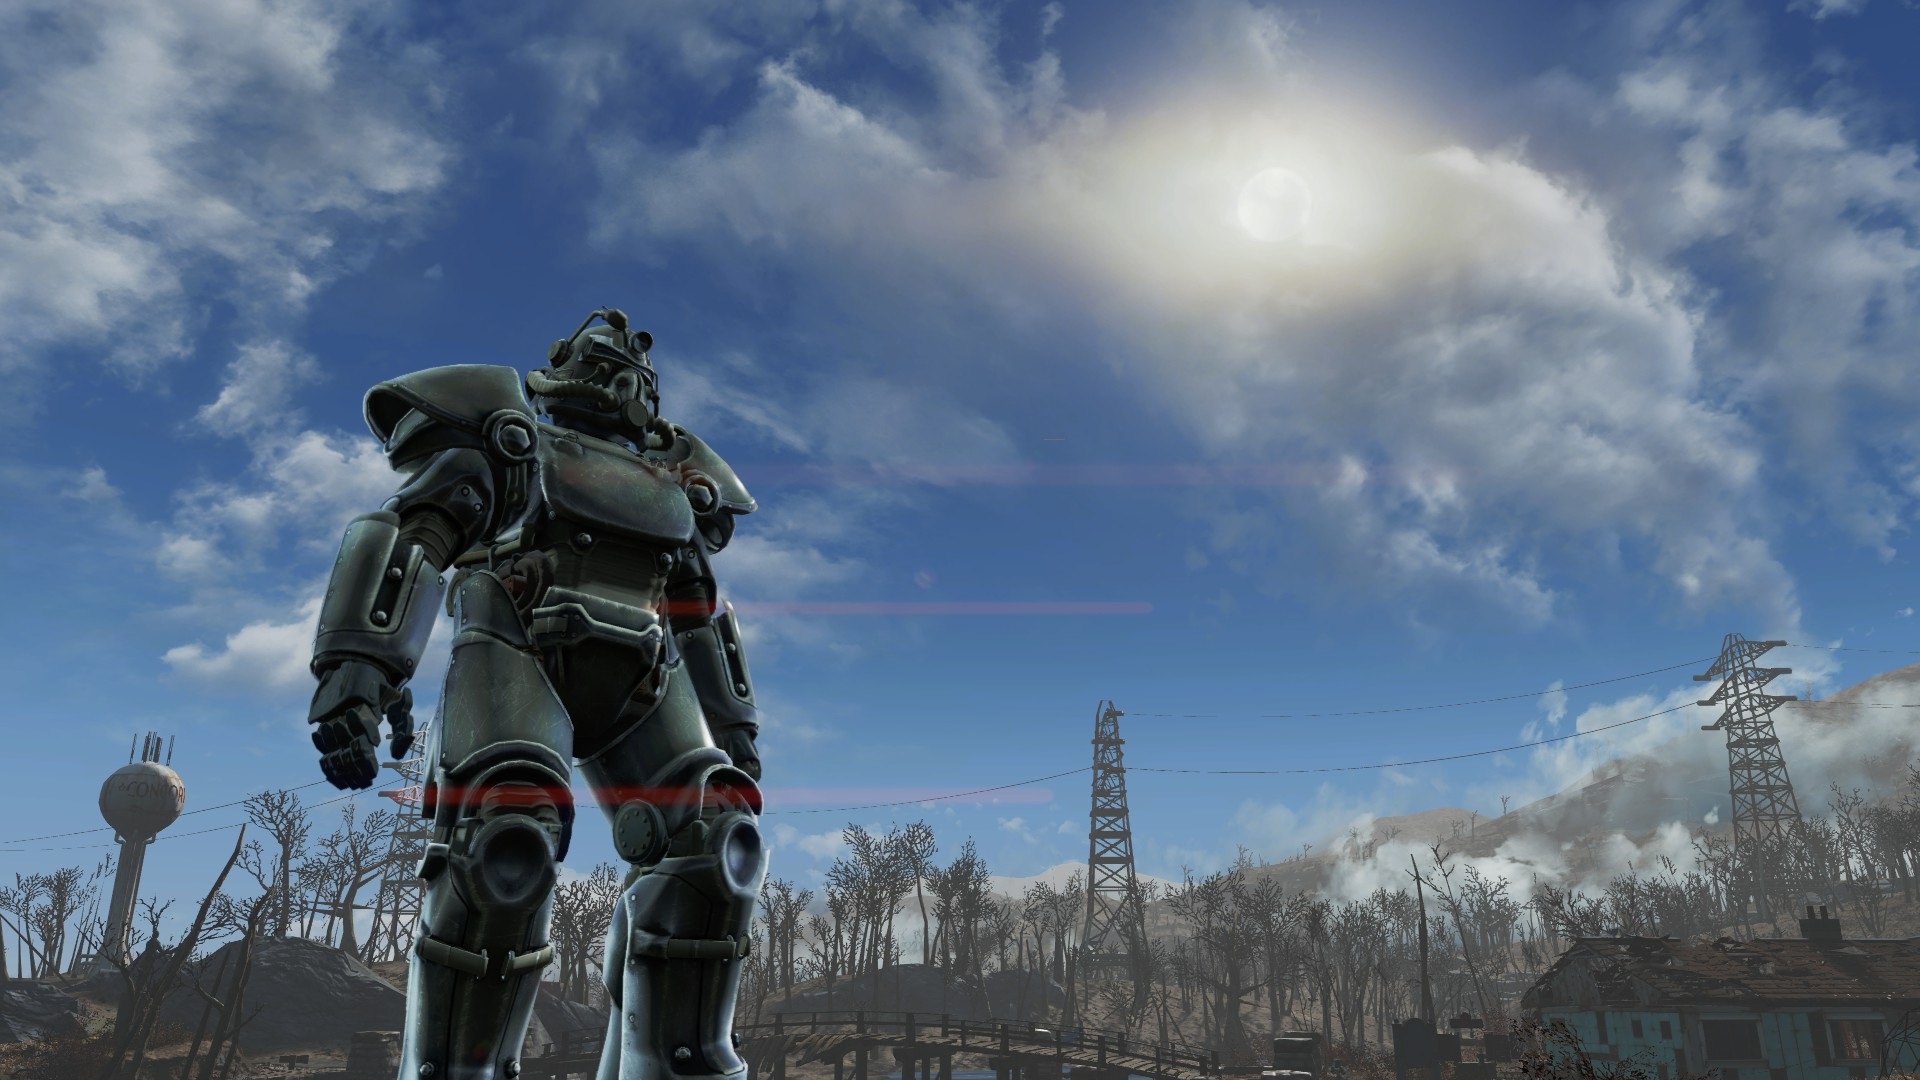 20190408134231_1.jpg - Fallout 4